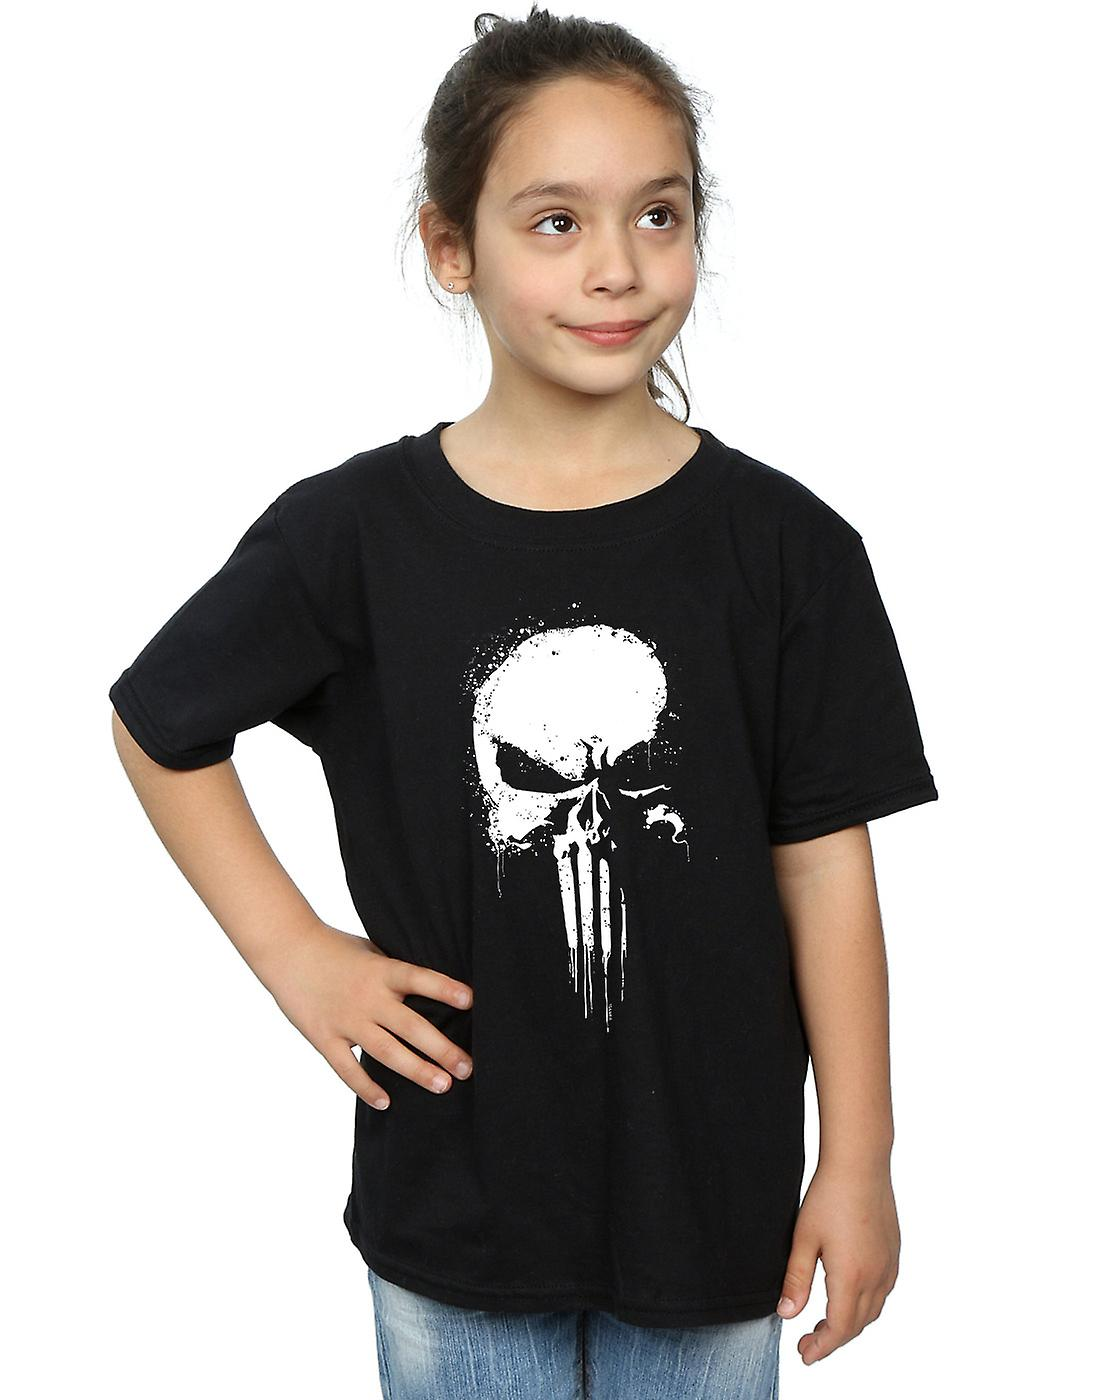 Marvel Girls The Punisher Spray Skull T-Shirt